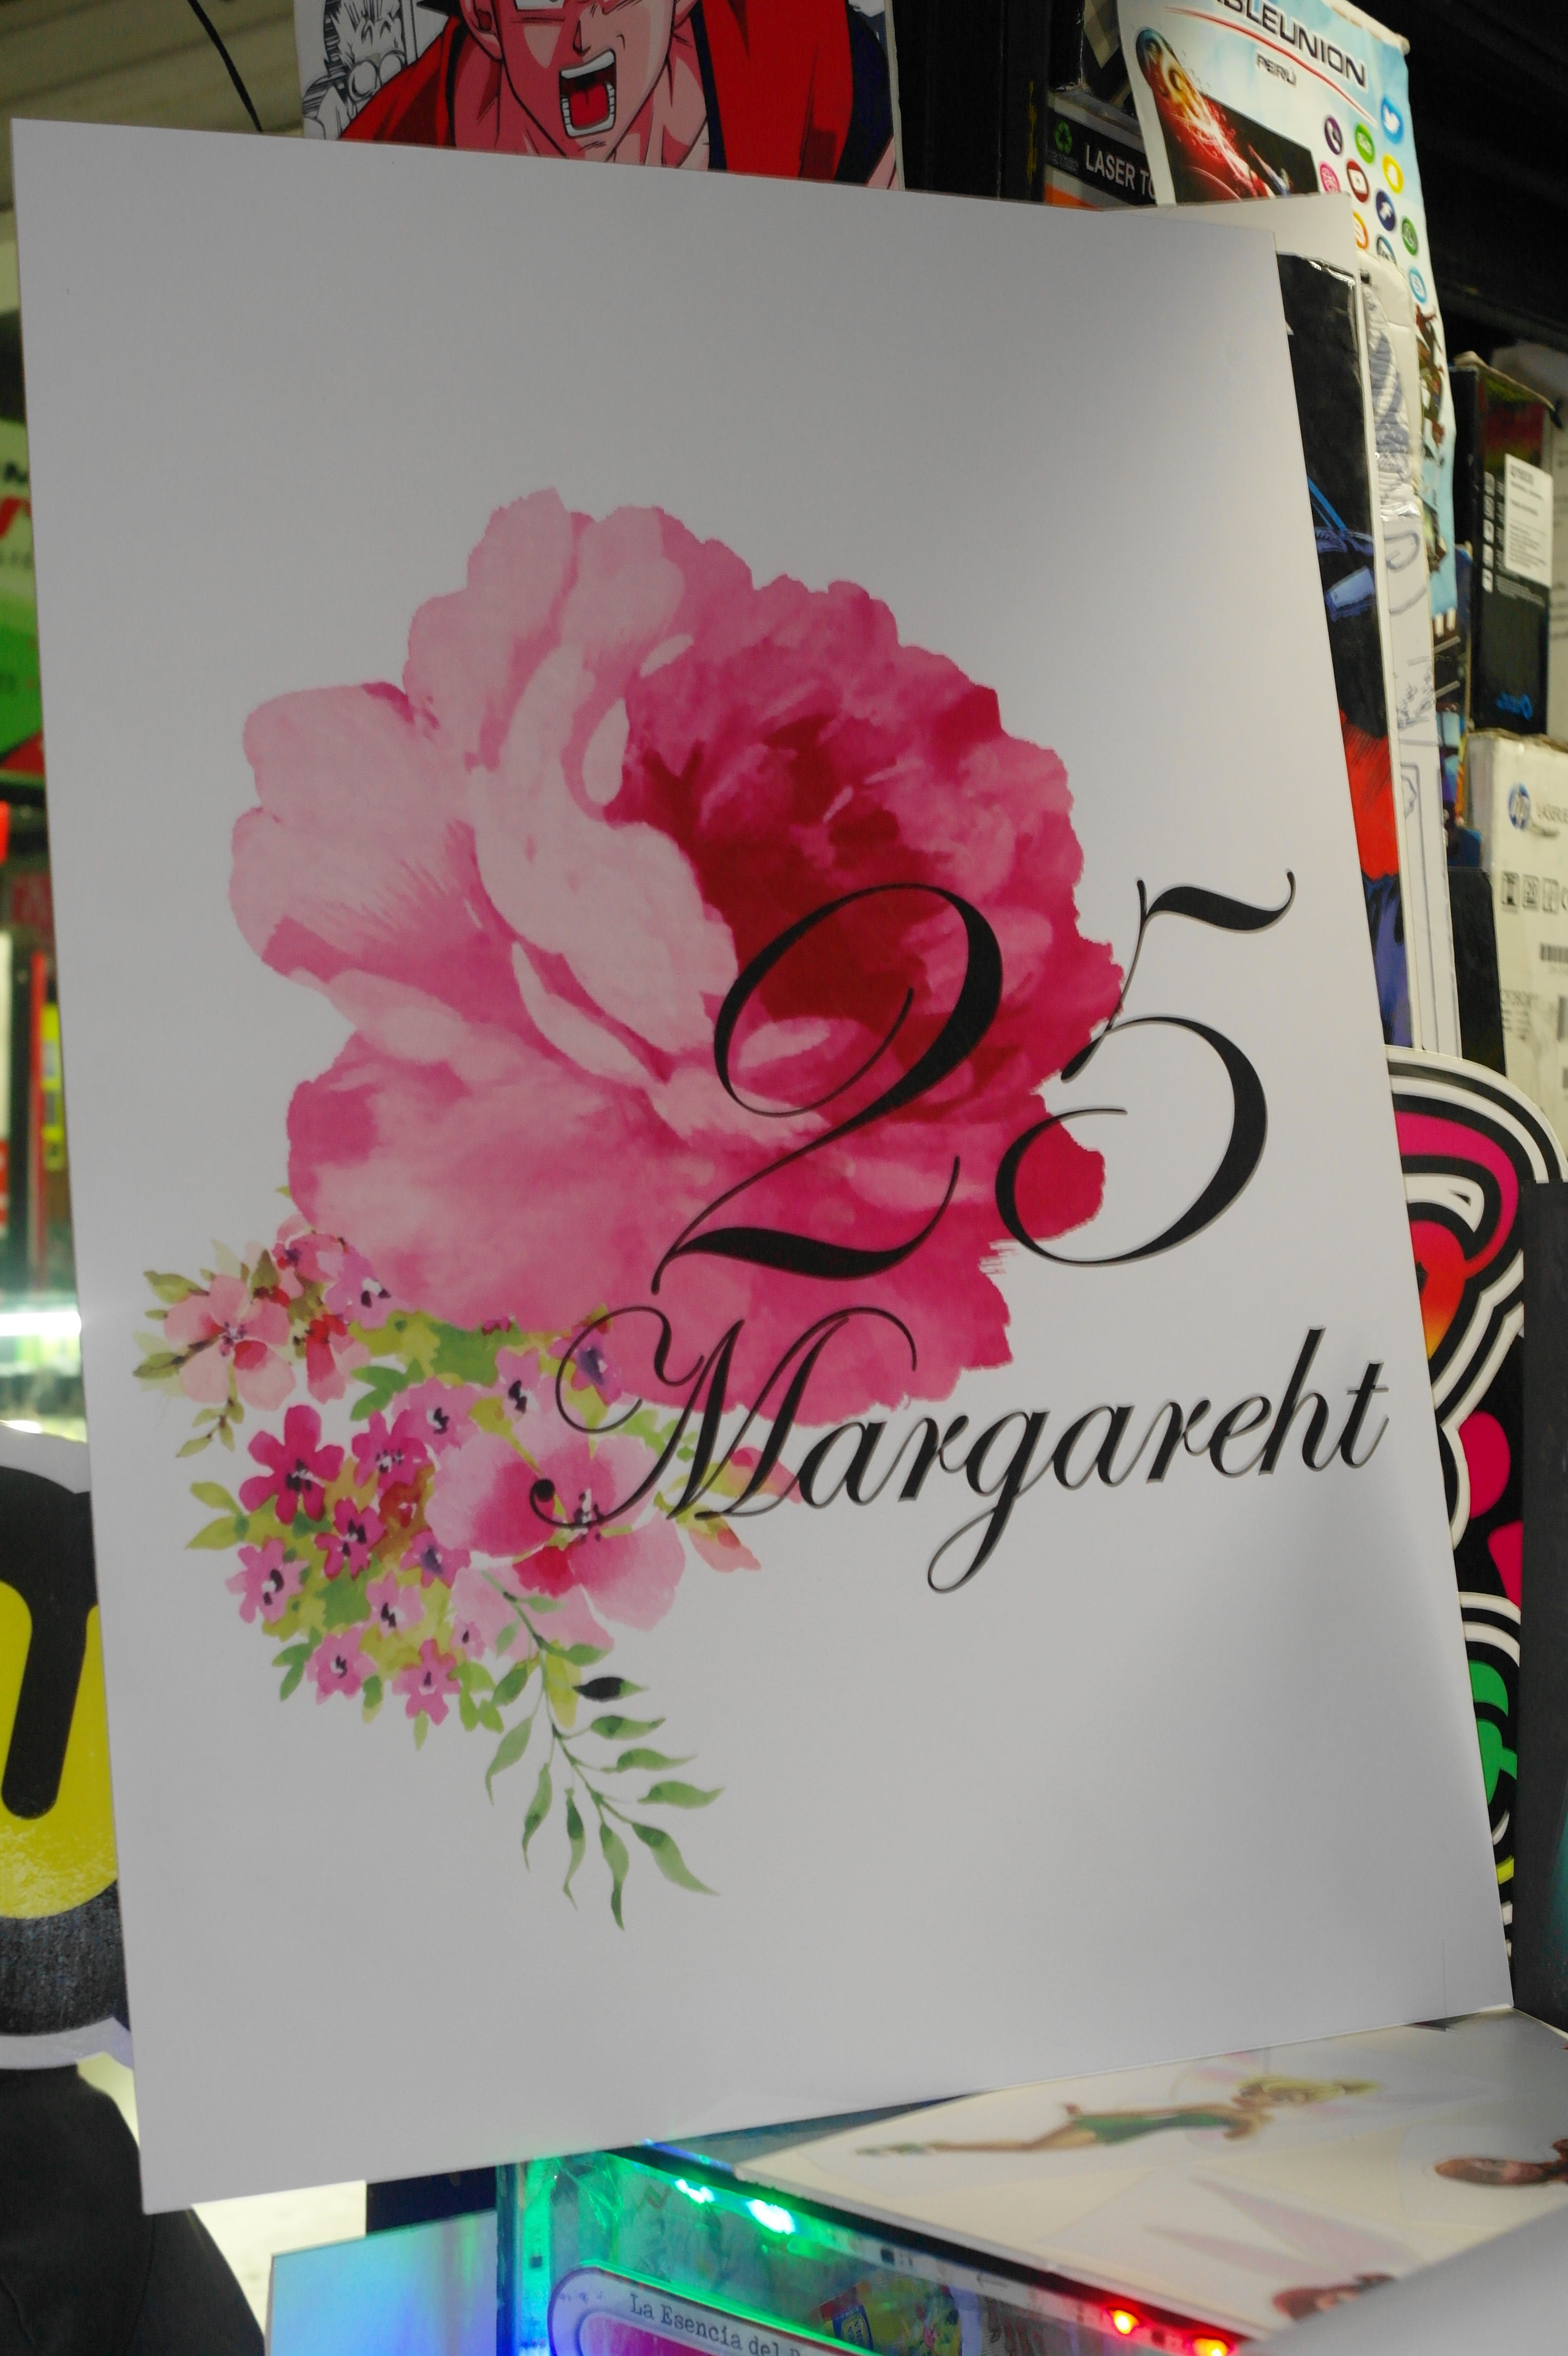 Free stock photo of #cuadro #rosas #25years